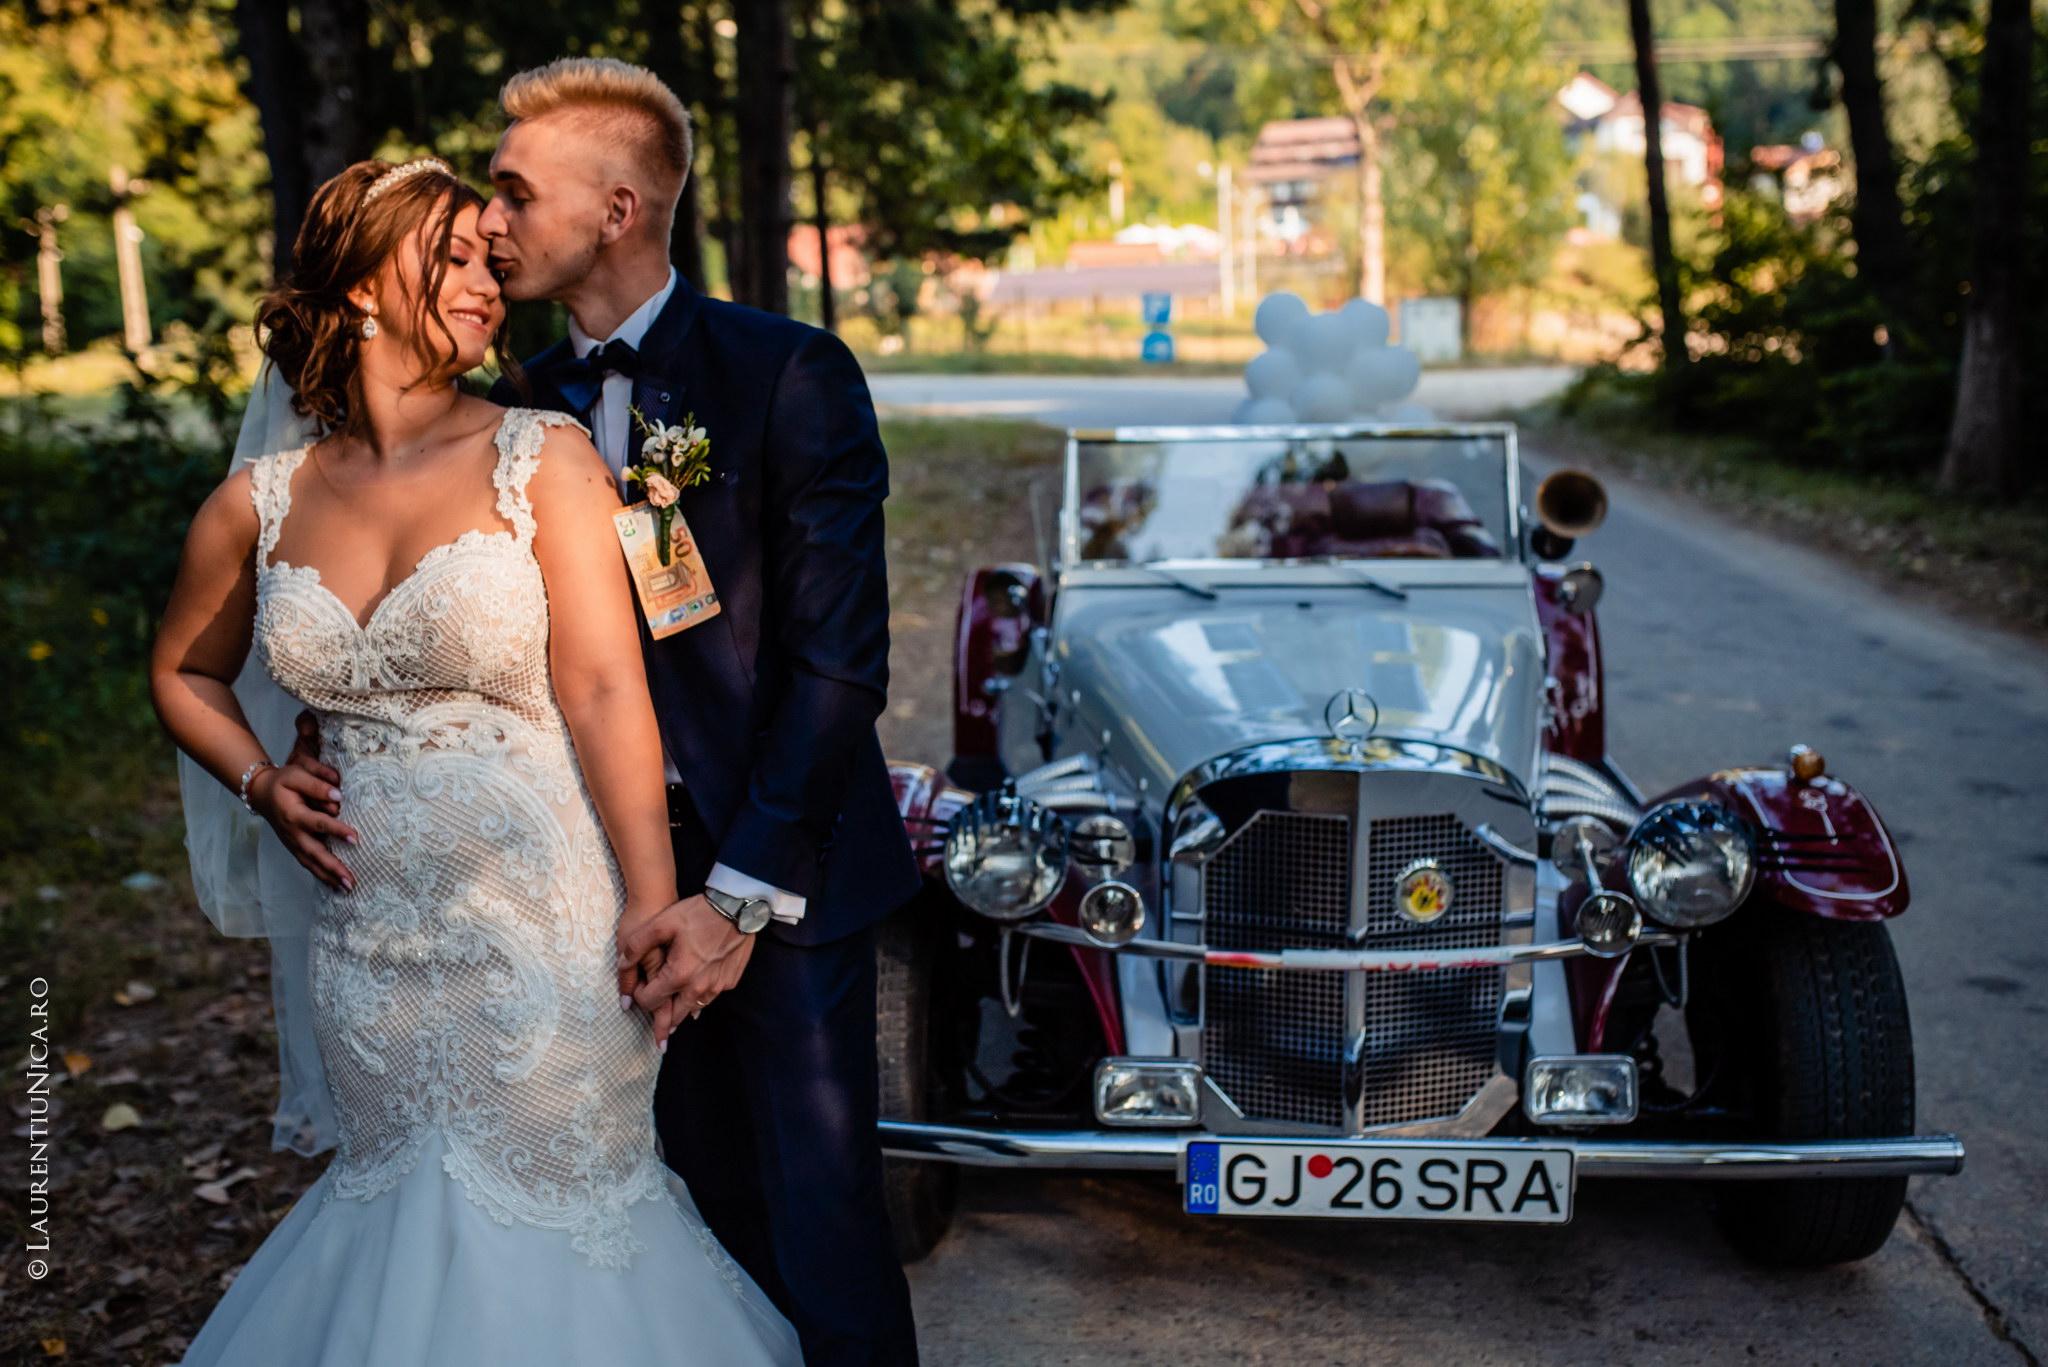 fotografii nunta Roxana si Cosmin fotograf nunta laurentiu nica 25 - Roxana & Cosmin | Fotografii nunta | Ticleni, judetul Gorj